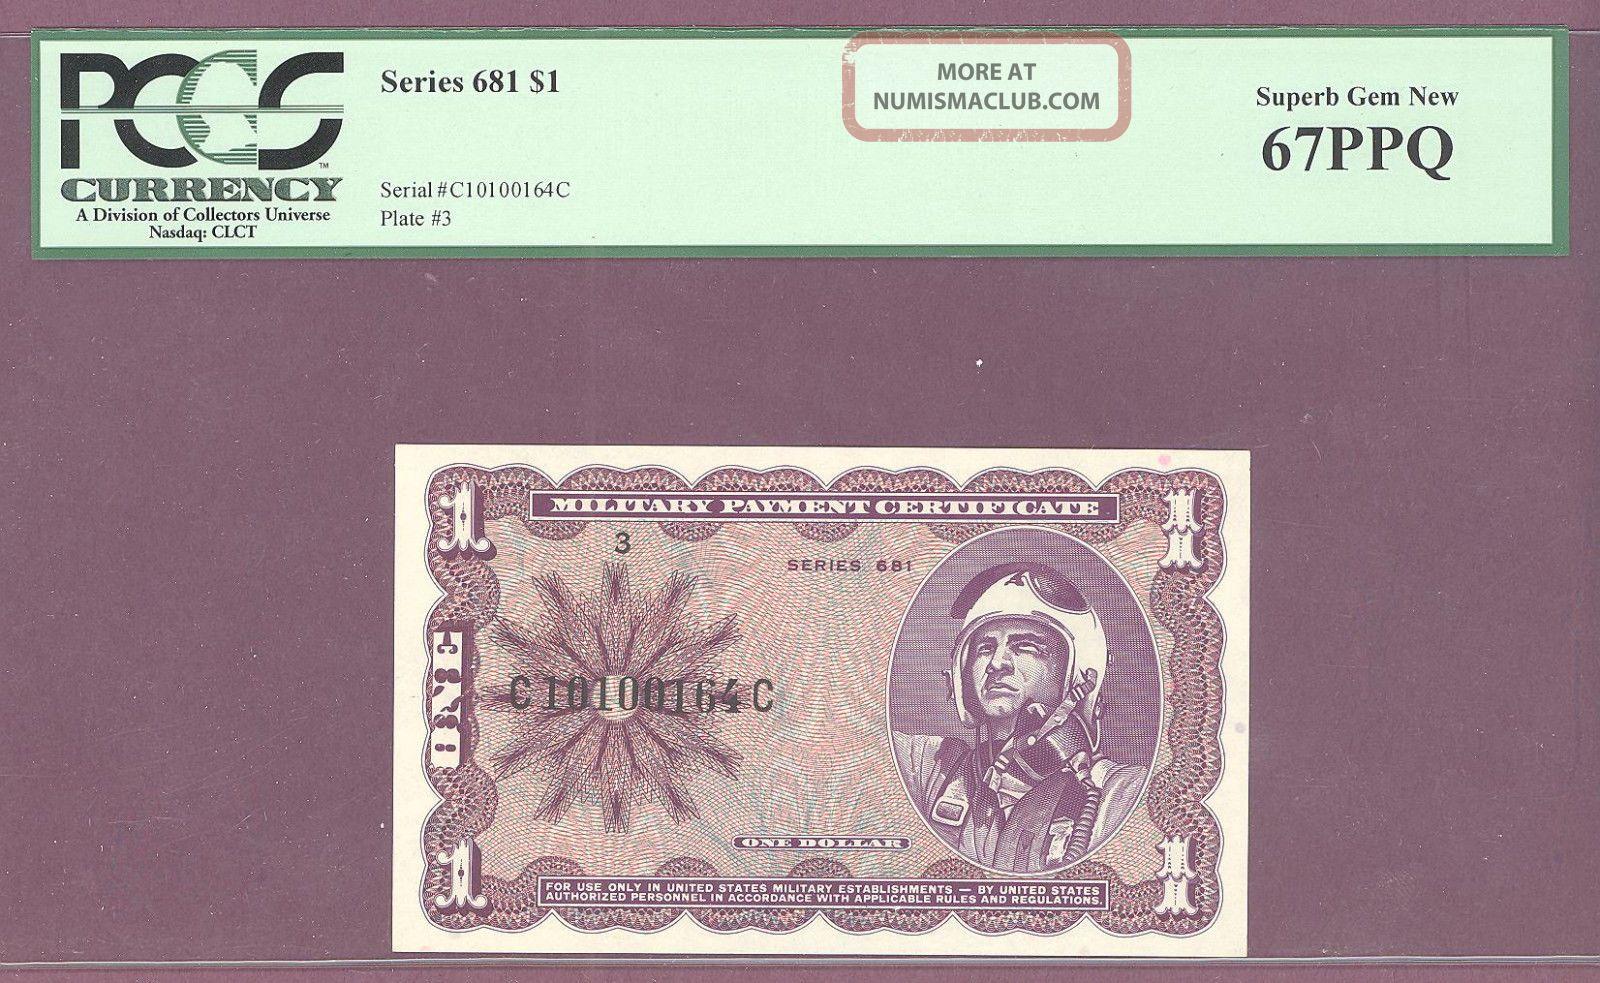 Series 681 $1 Military Payment Certificate Mpc Pcgs 67 Ppq Gem Paper Money: US photo